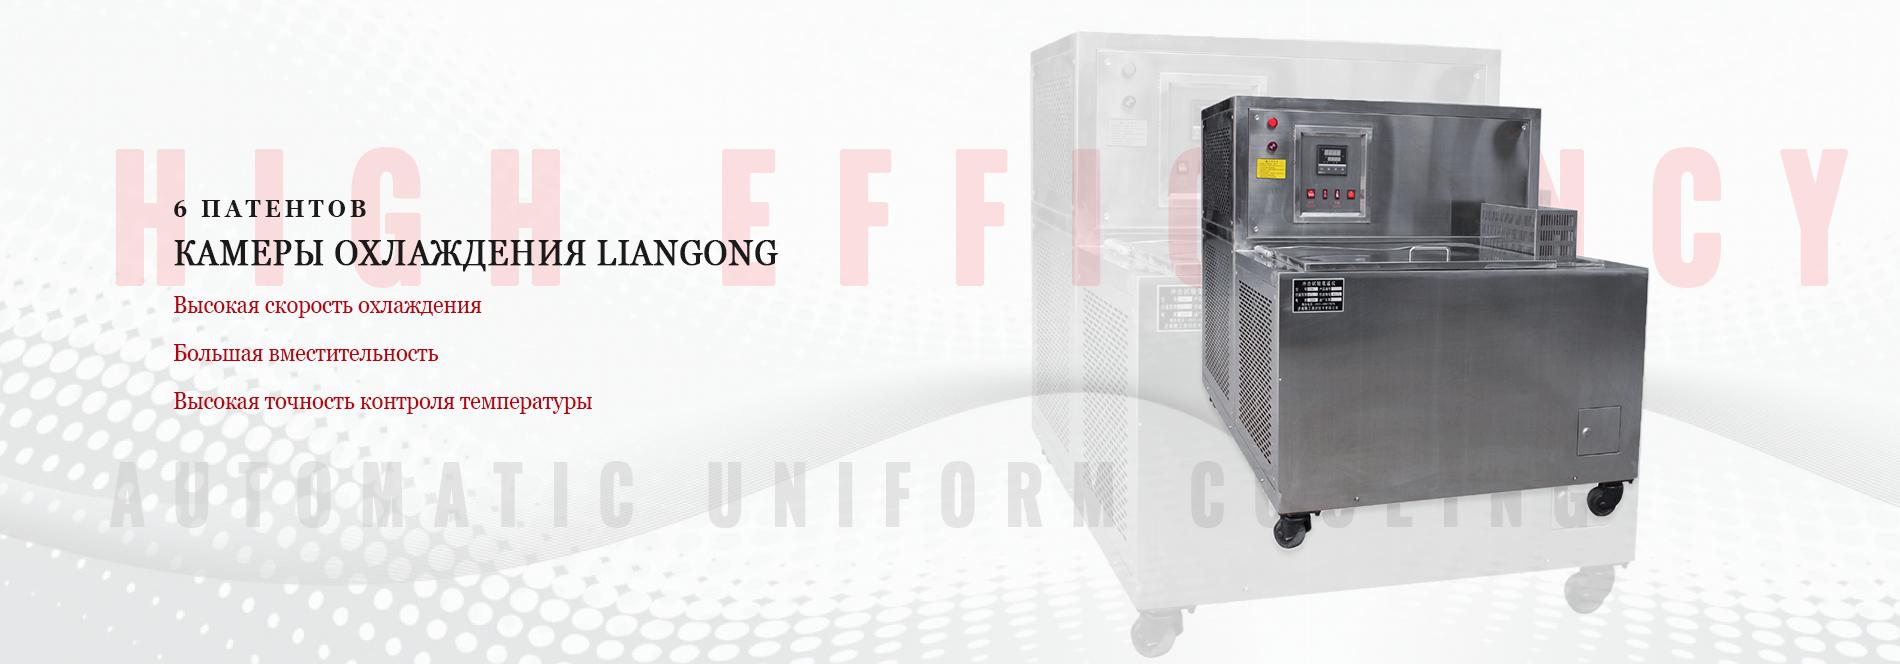 Криостаты Liangong преимущества и новинки